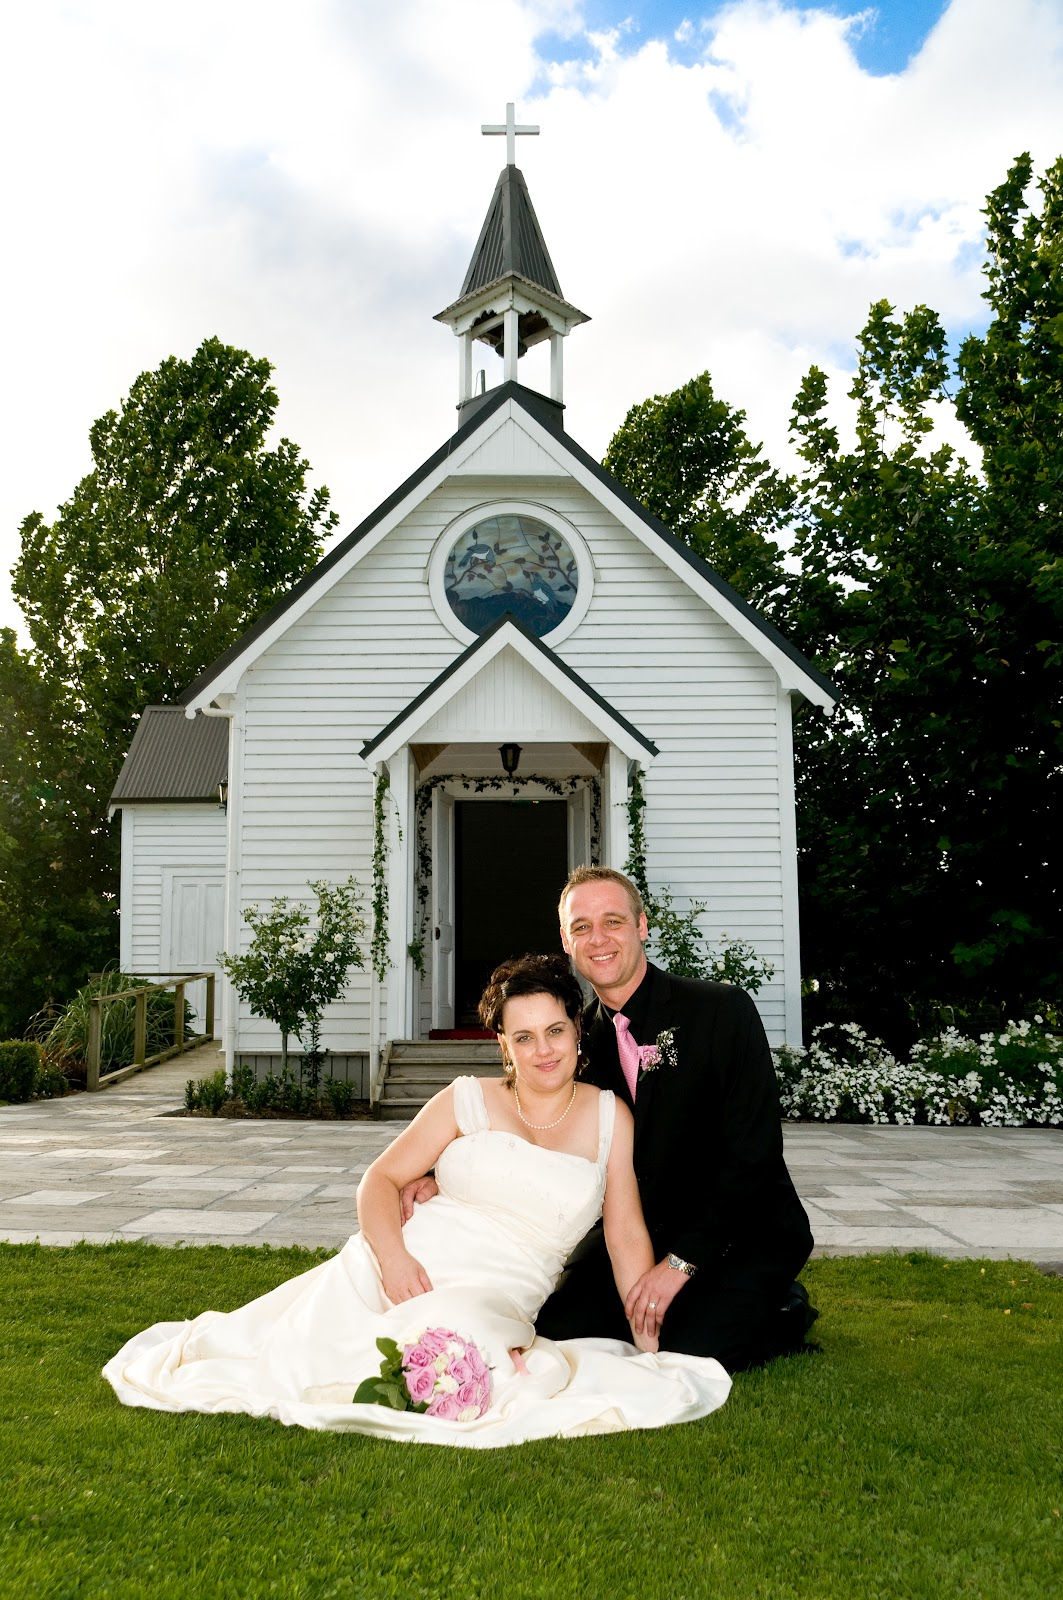 Sarnia Park Wedding New Zealand Photography By Amkphotography